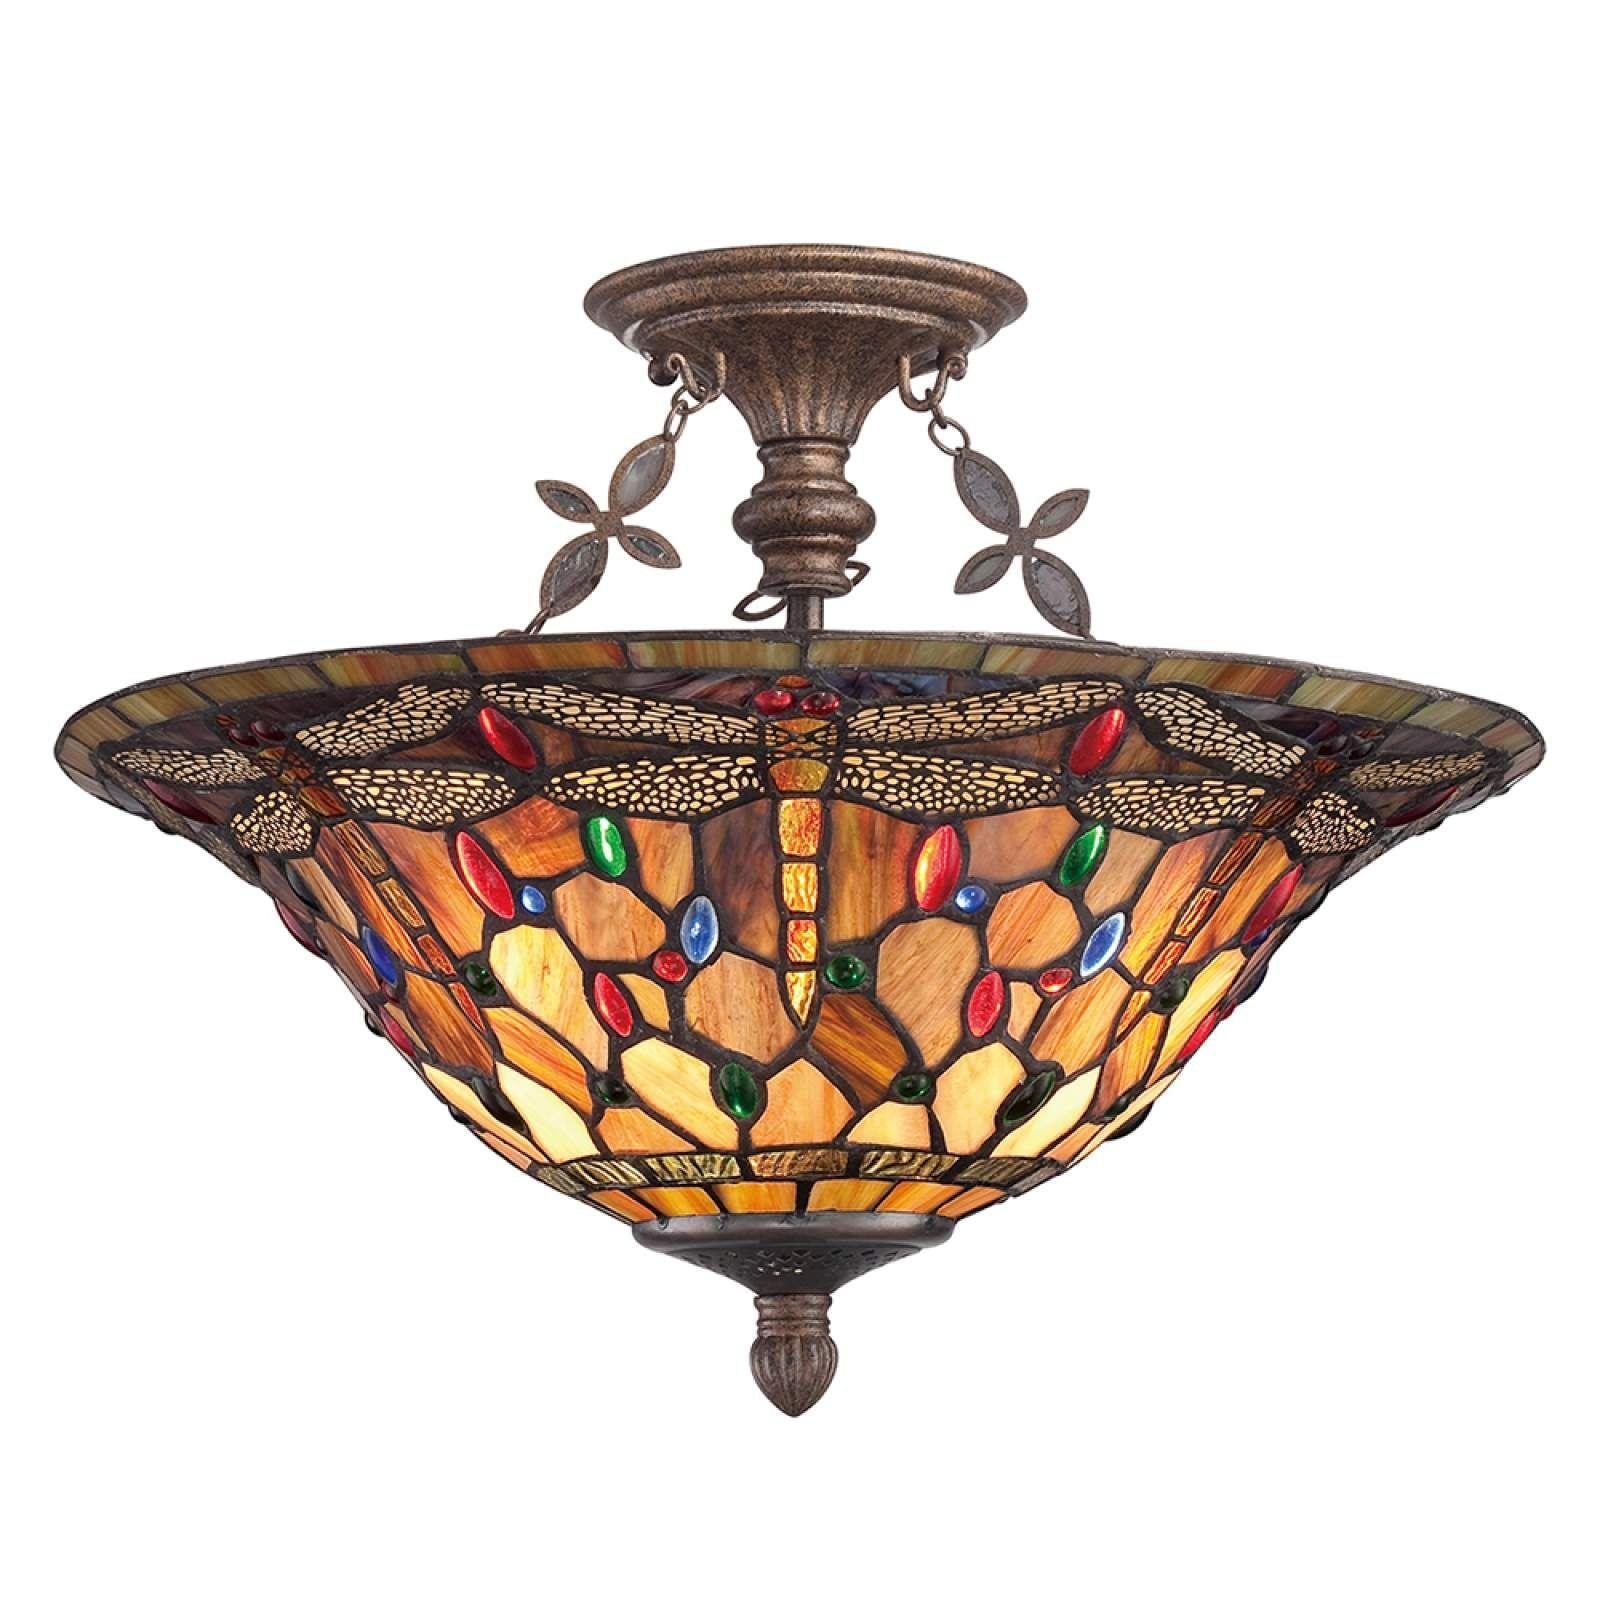 Tiffany Lampe Deckenlampe